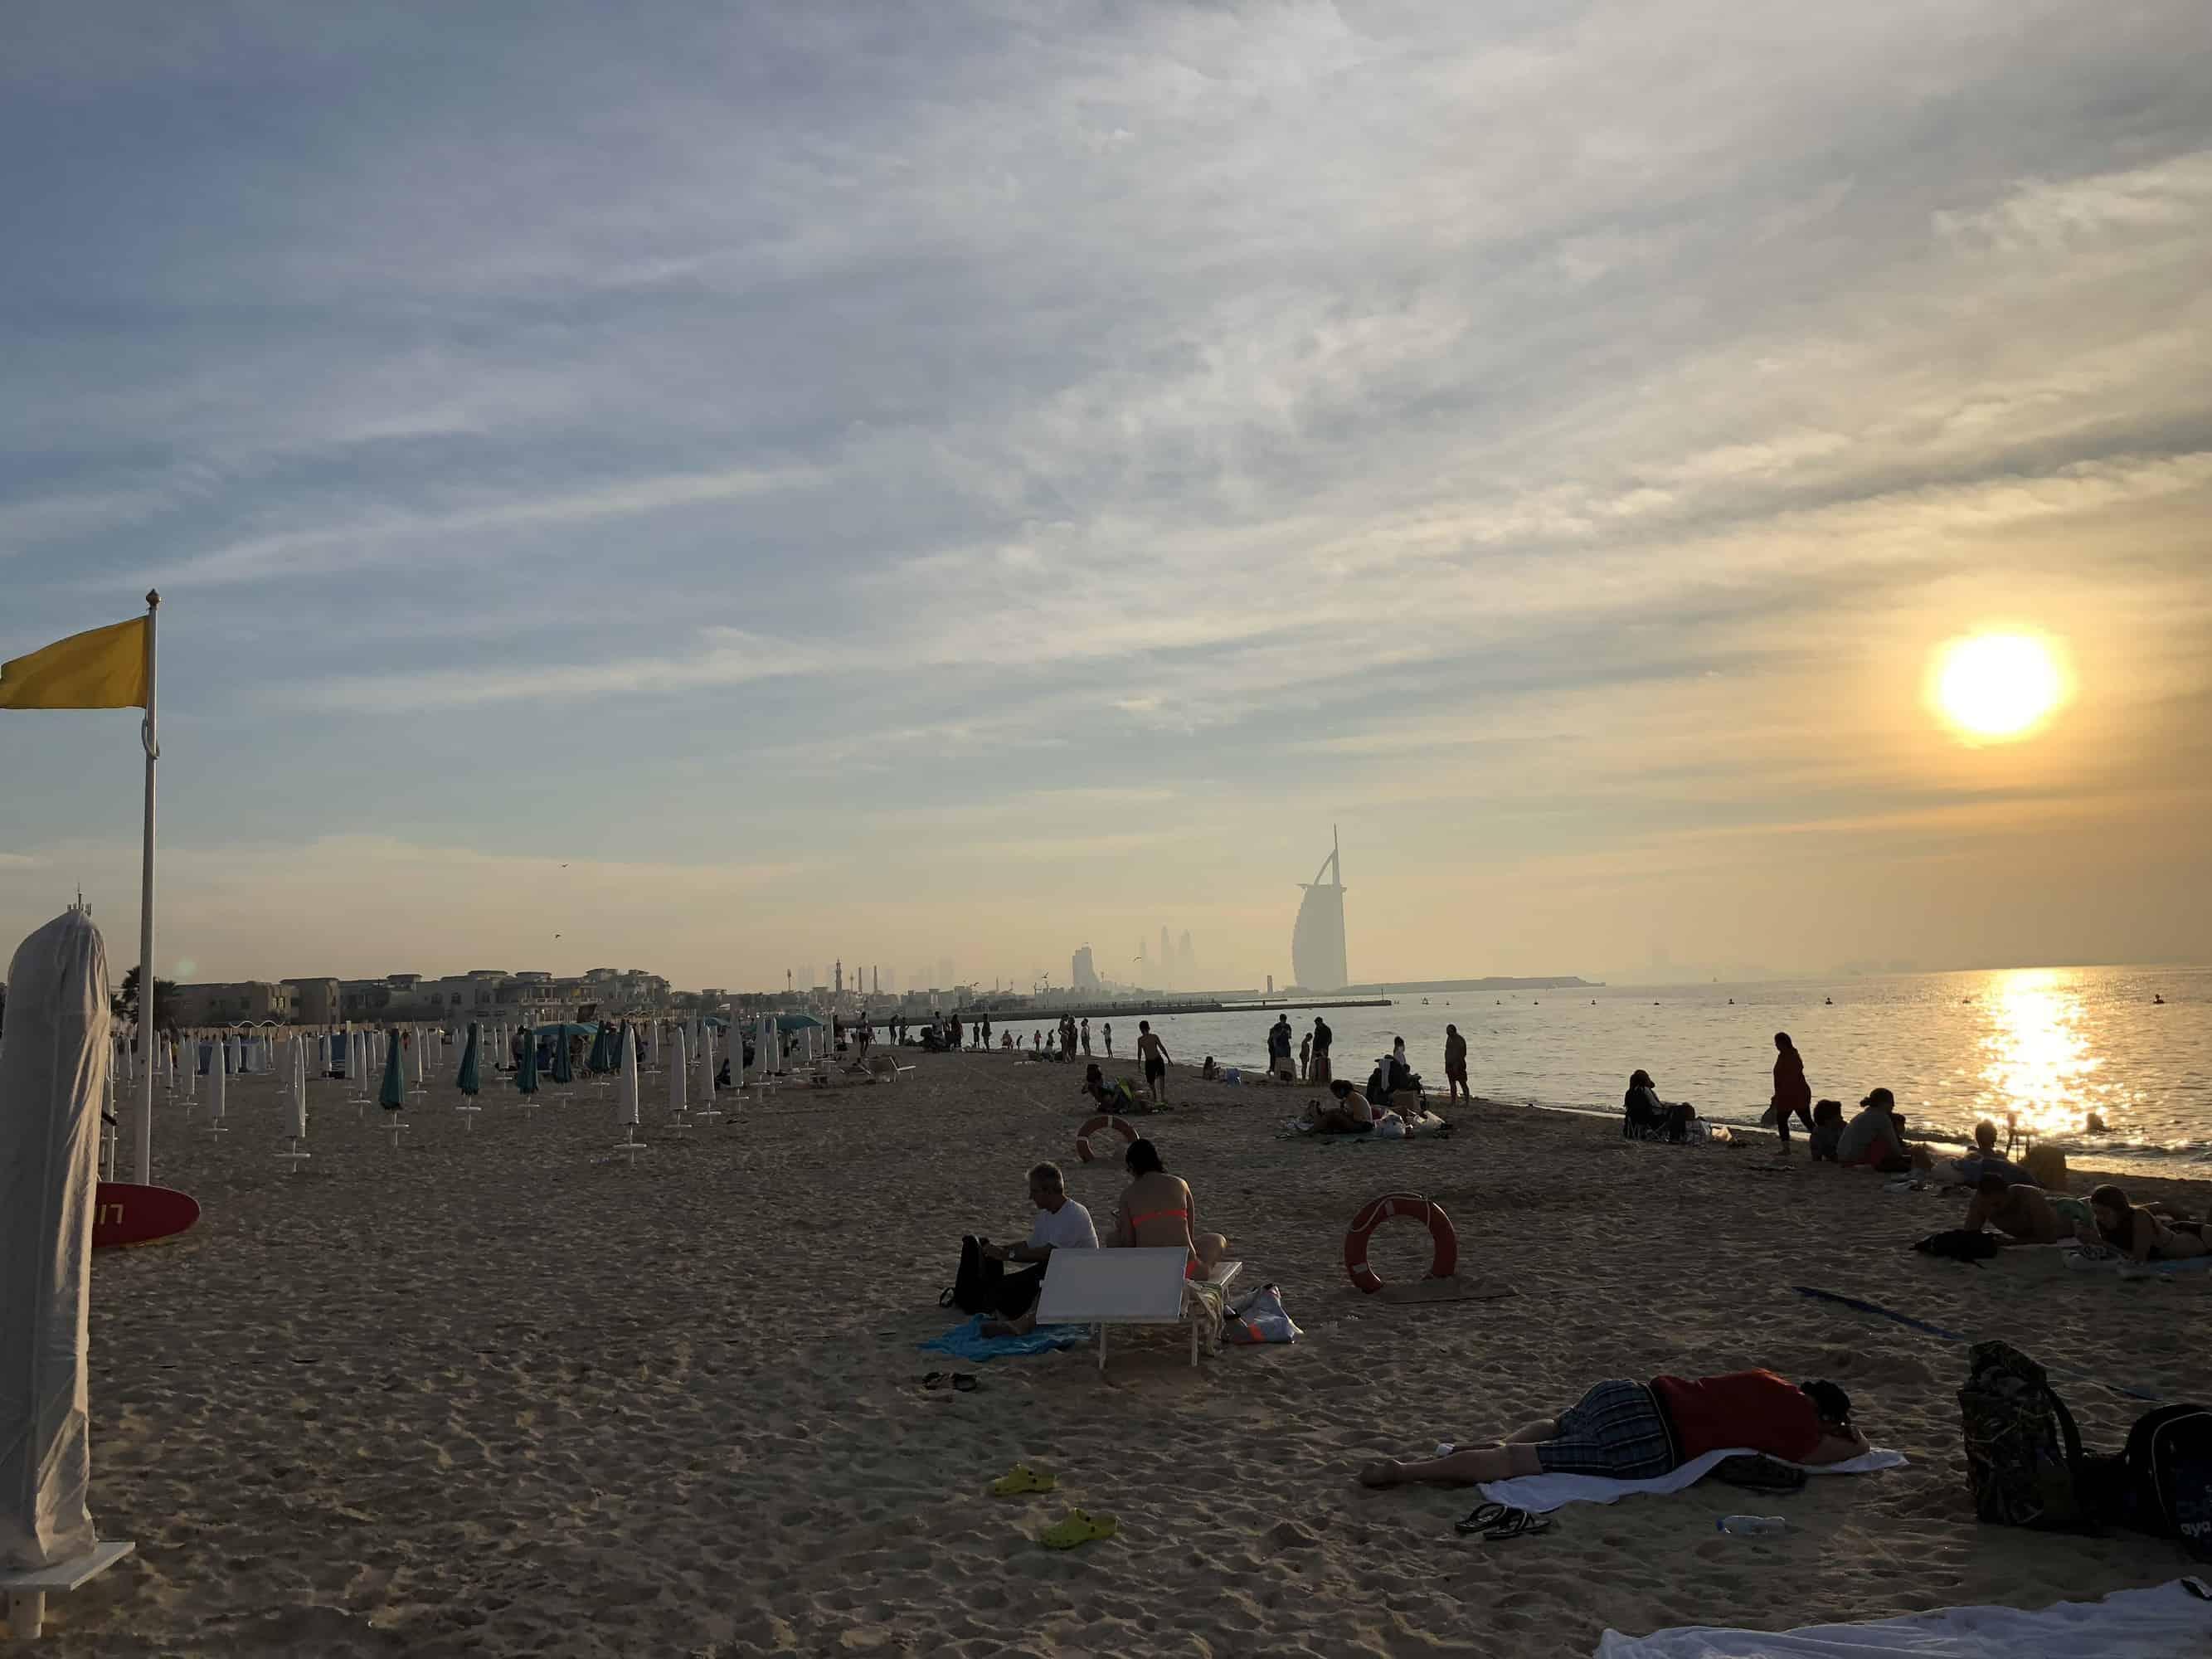 Dubaj pláž kousek od letiště